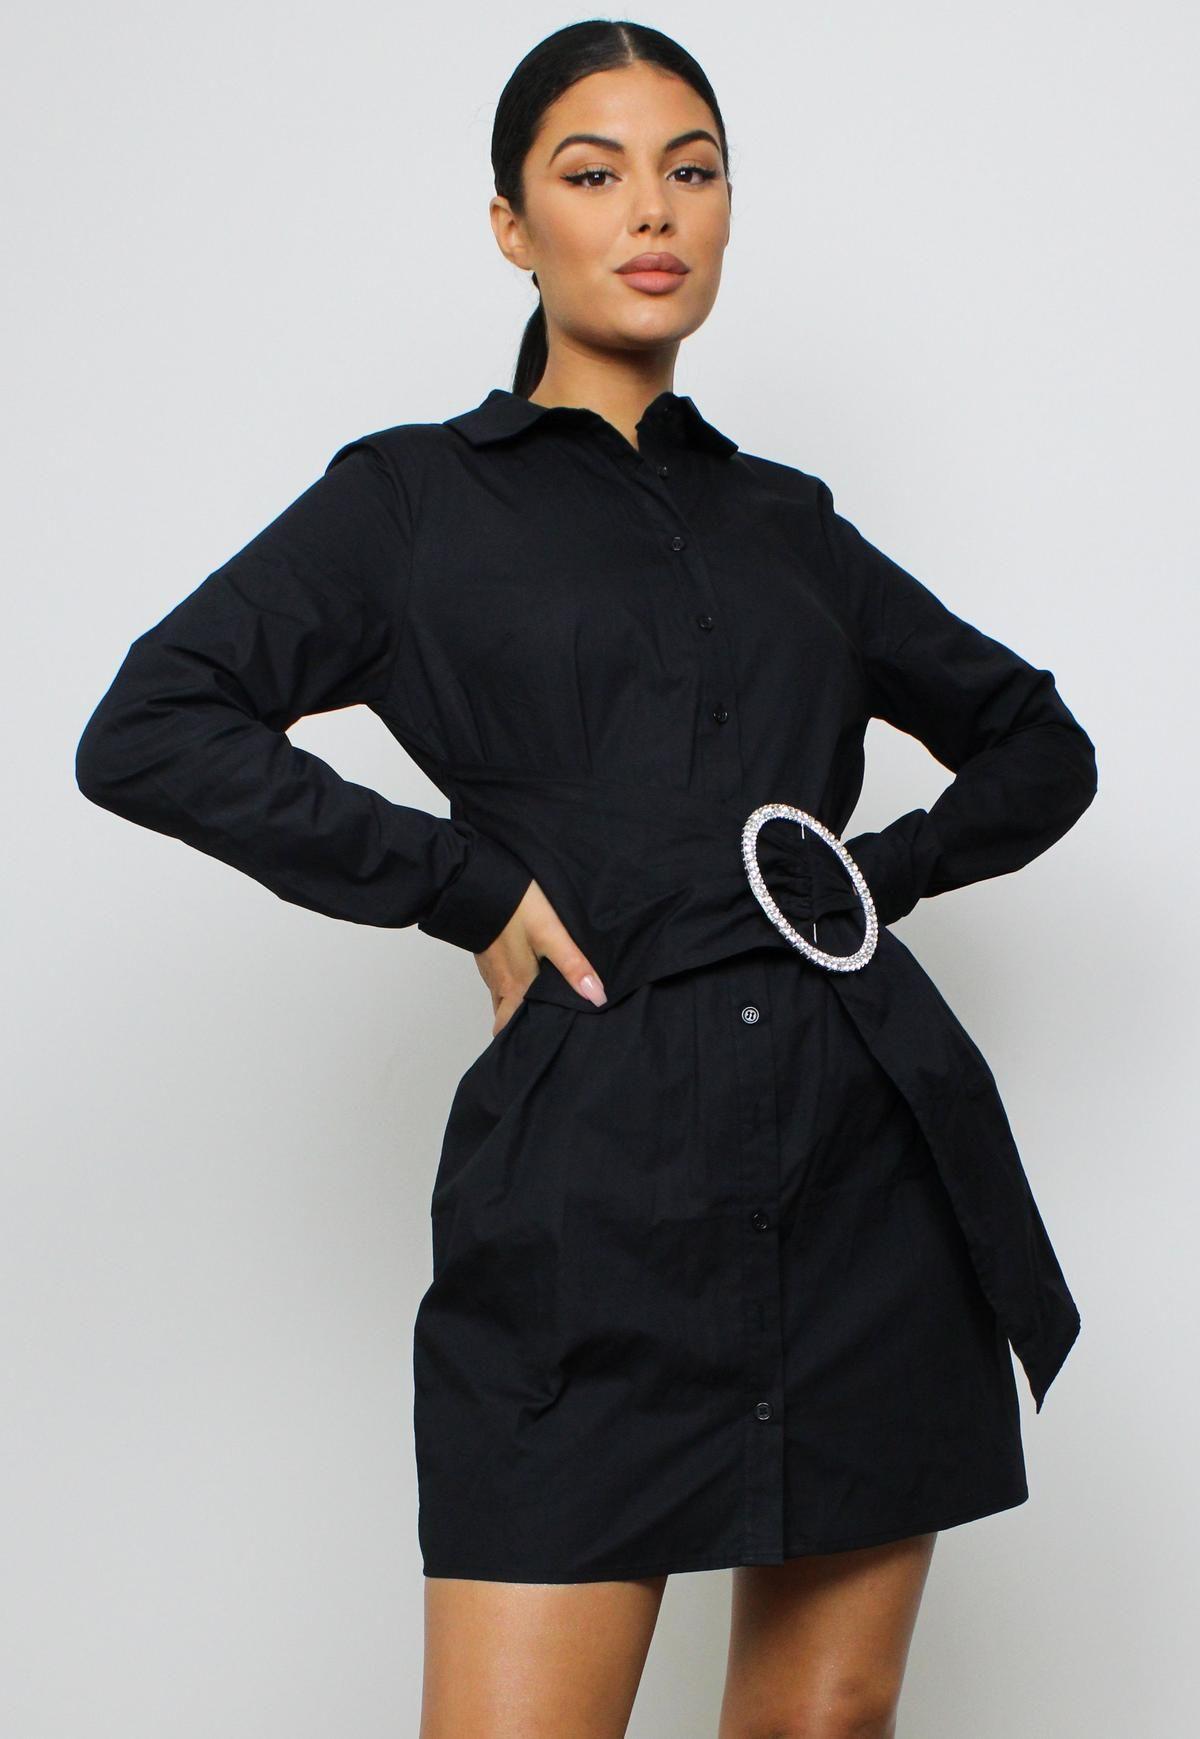 Missguided Black Diamante Belted Shirt Dress Black Shirt Dress Belted Shirt Dress Shirt Dress [ 1739 x 1200 Pixel ]